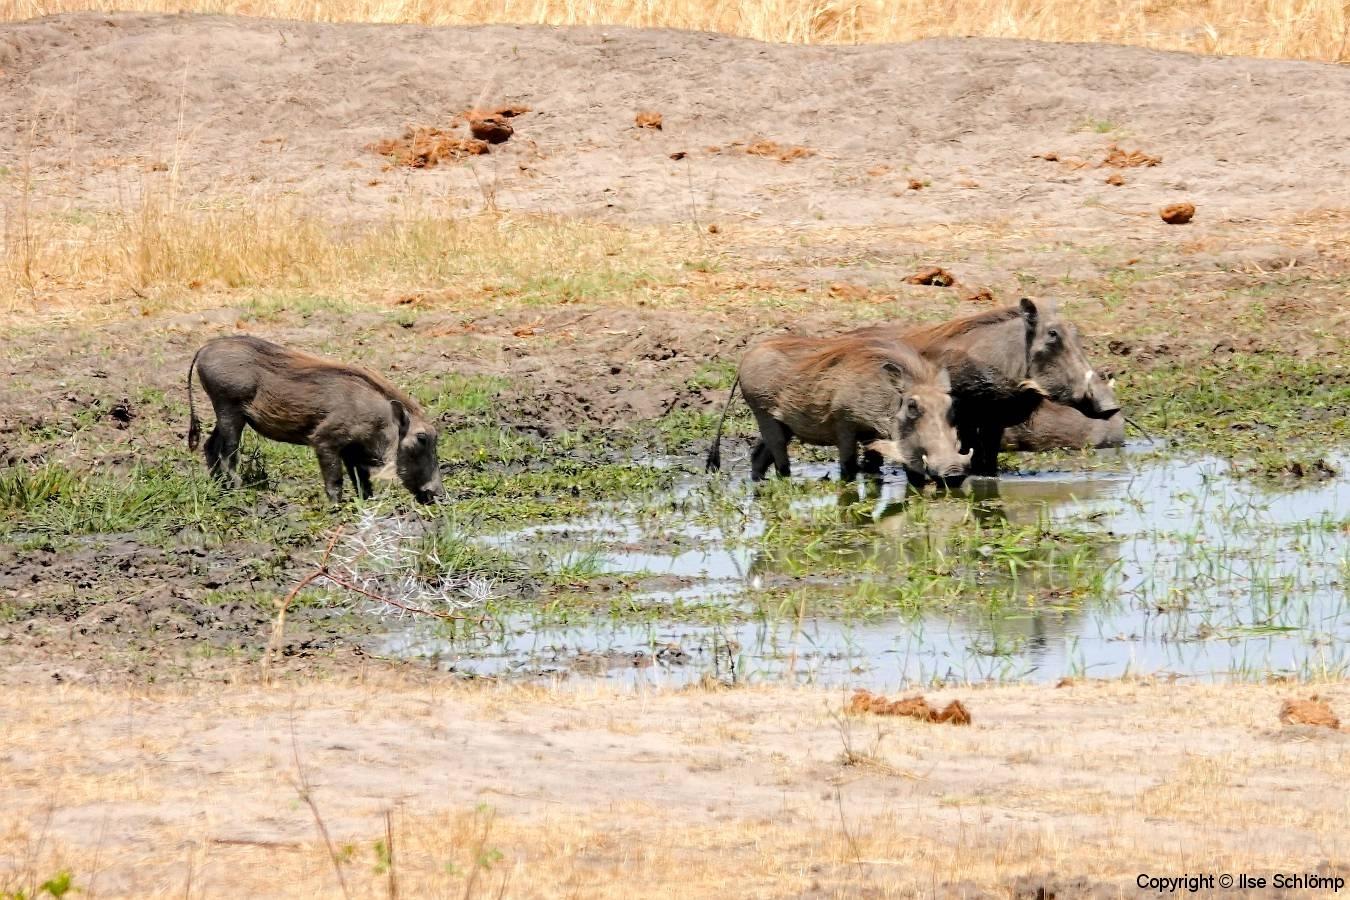 Simbabwe, Hwange Nationalpark, Elephants Eye, Warzenschweine